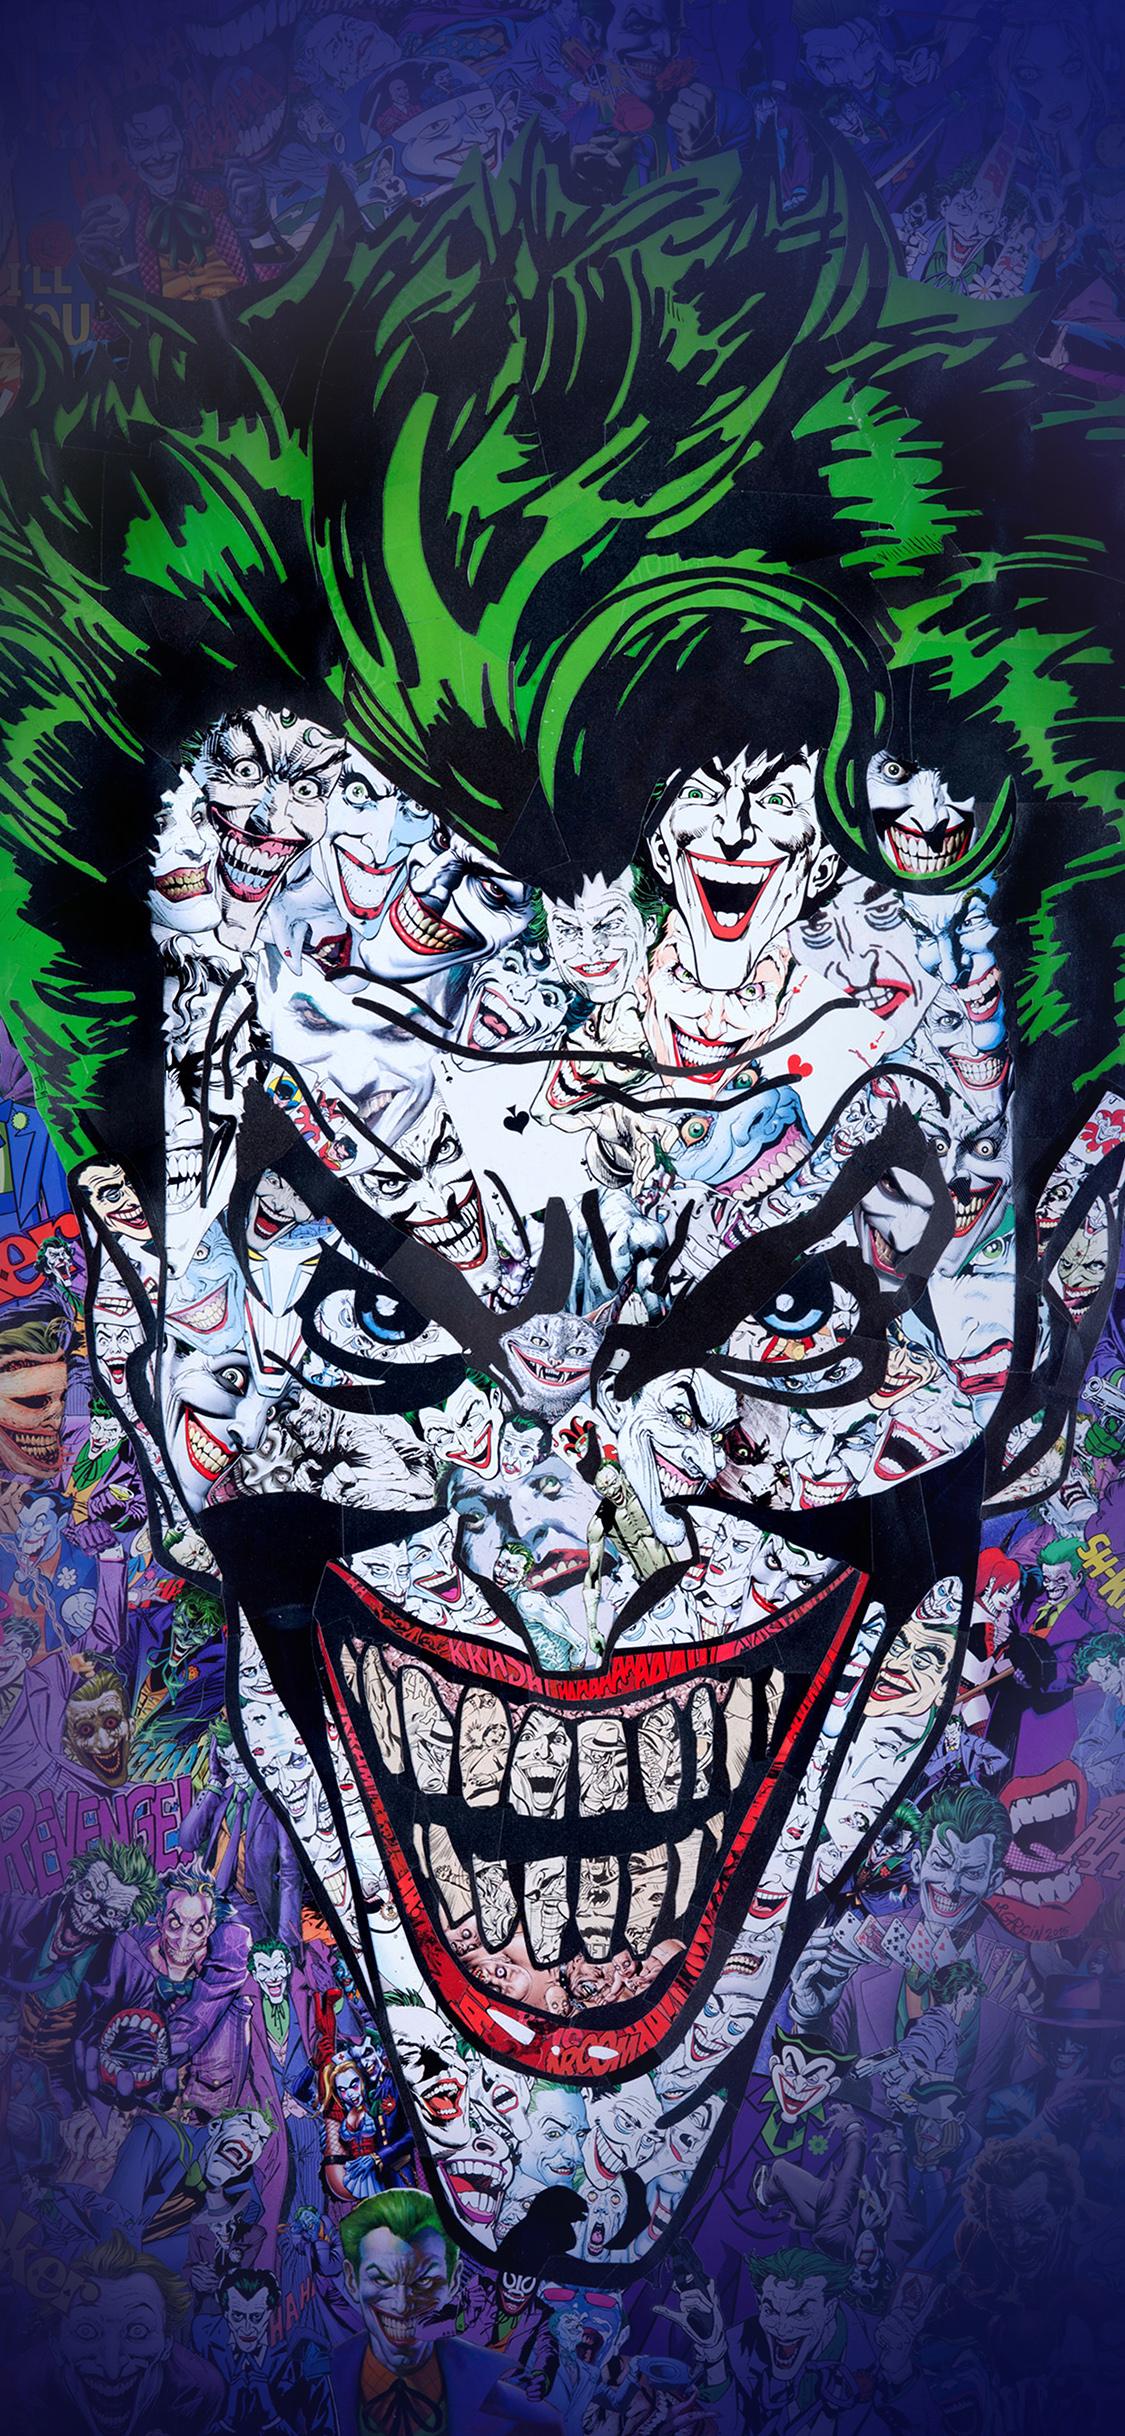 Au55 joker art face illustration art